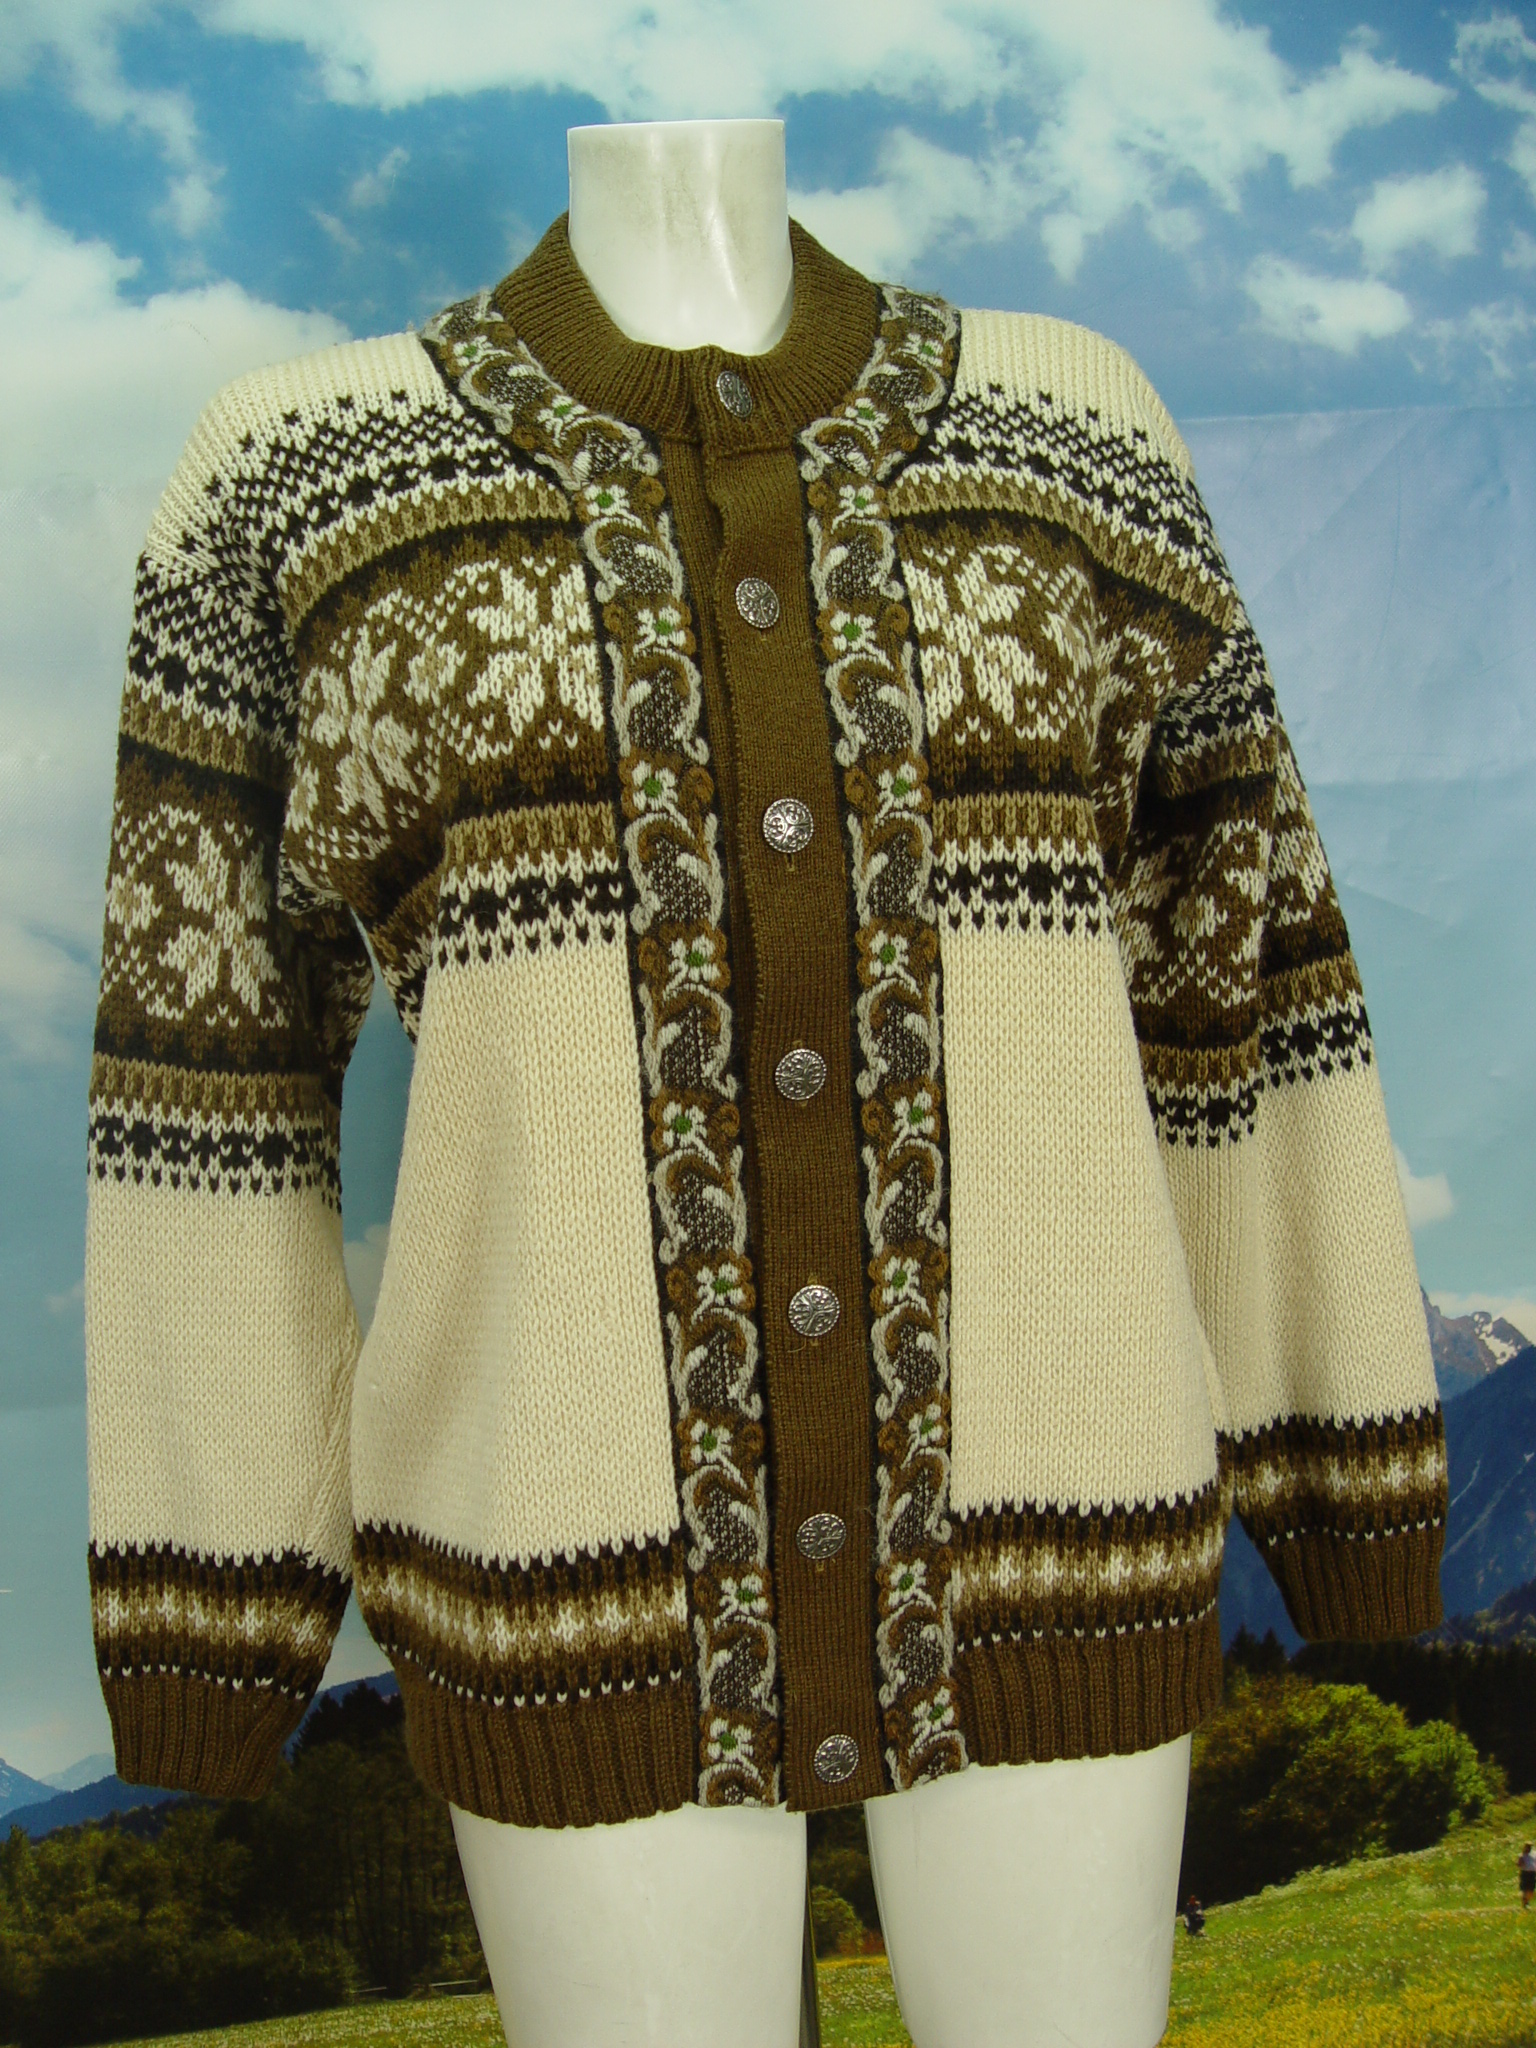 Norweger Strickjacke 50 Neuwertig Damen Jacke Gr Fashion Fjord Herren yvI6Ybf7g